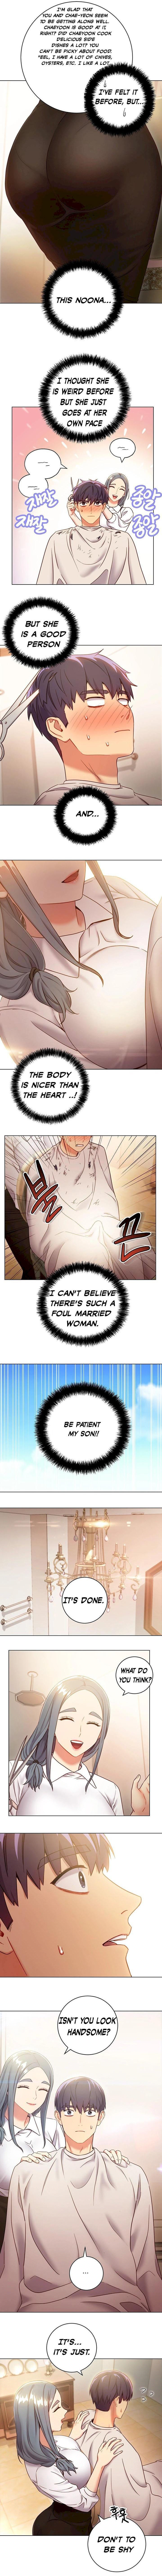 [Neck Pilllow] Stepmother Friends Ch.39/? [English] [Hentai Universe] NEW! 13/10/2020 201